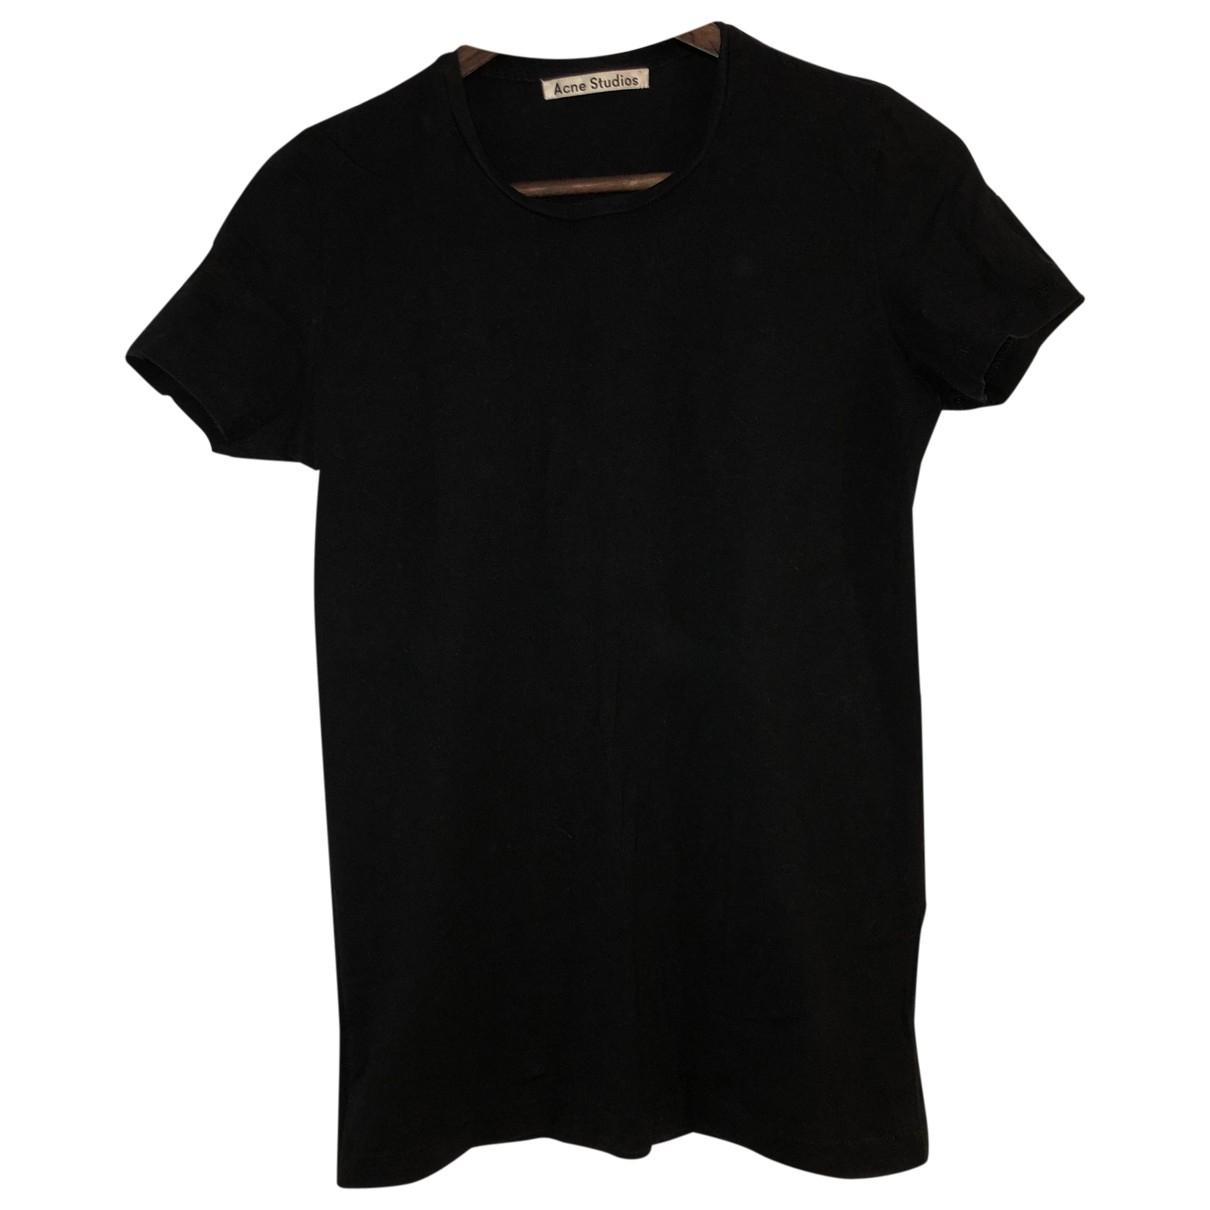 Acne Studios \N Black Cotton  top for Women M International